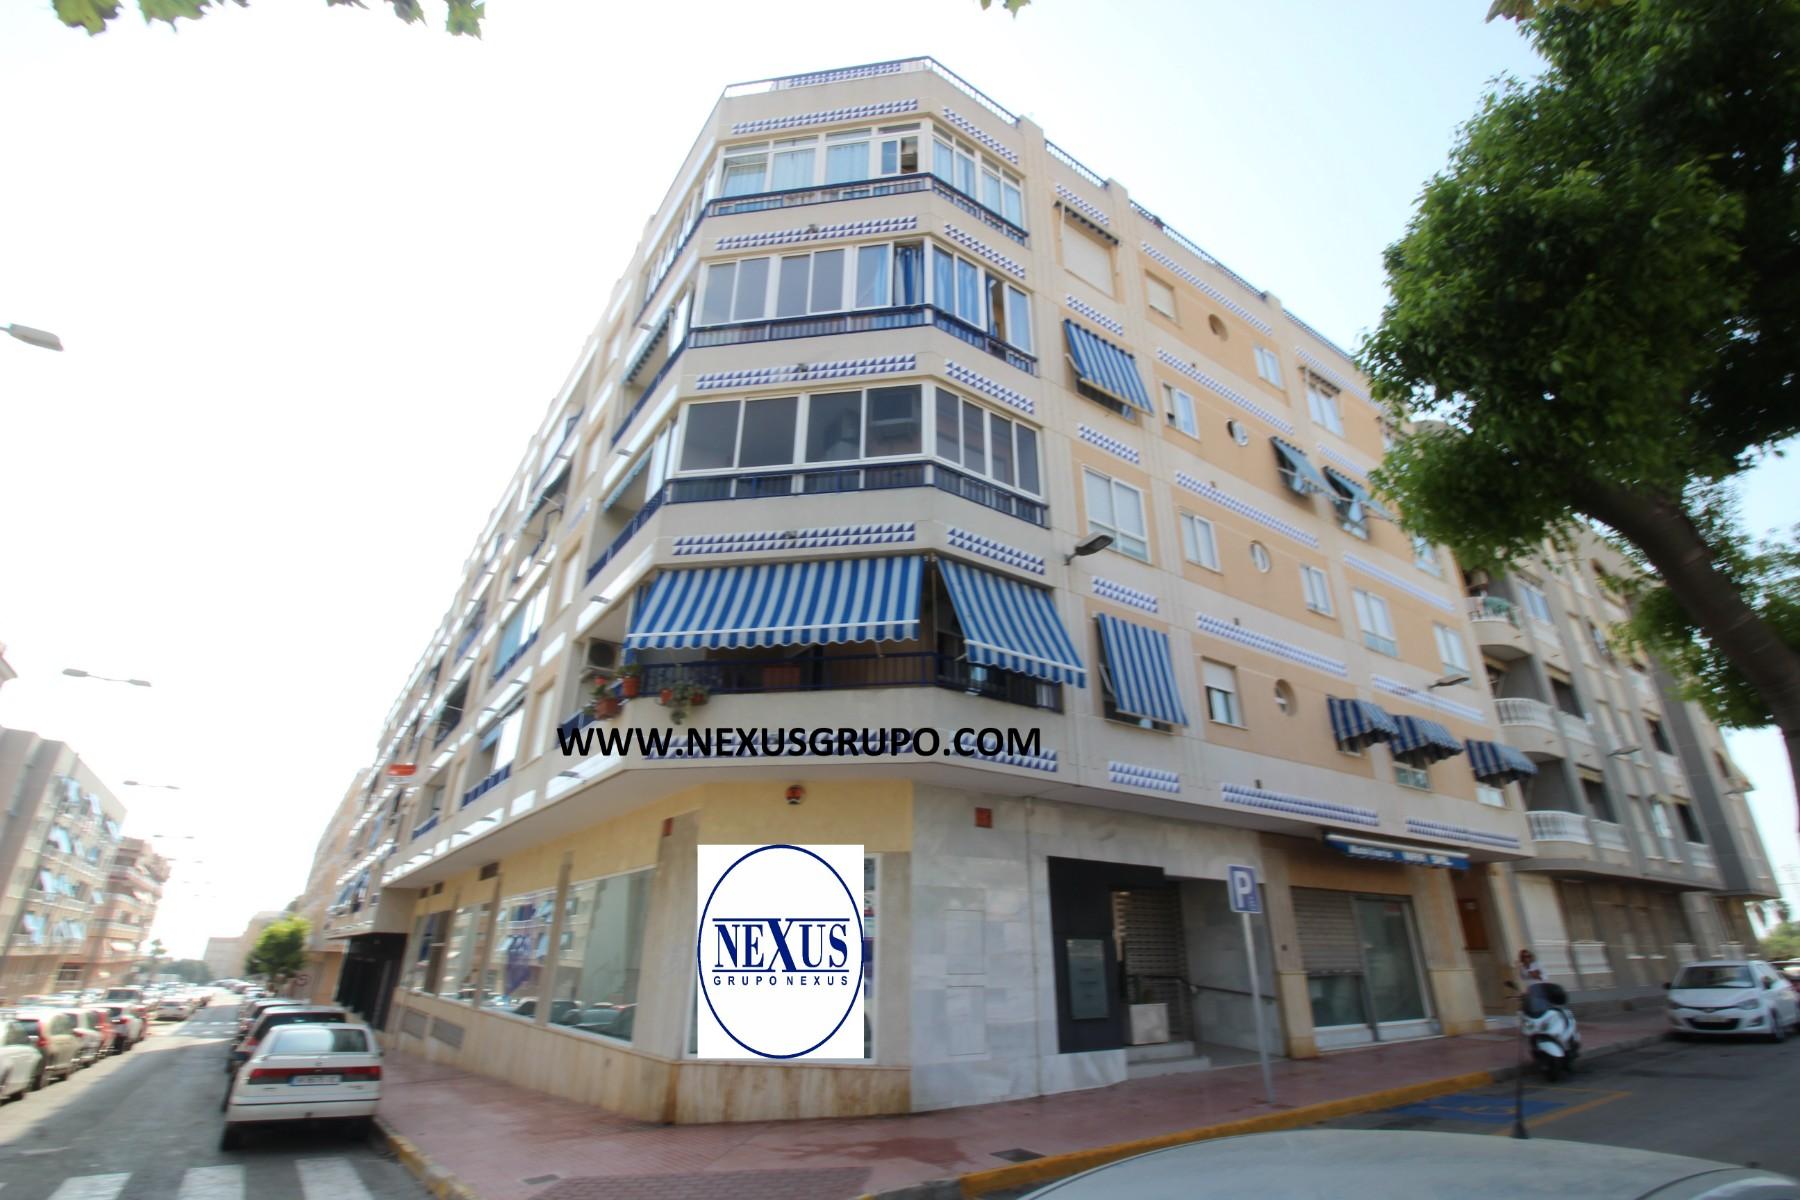 INMOBILIARIA GRUPO NEXUS VENDE, EXCELENTE APARTAMENTO in Nexus Grupo